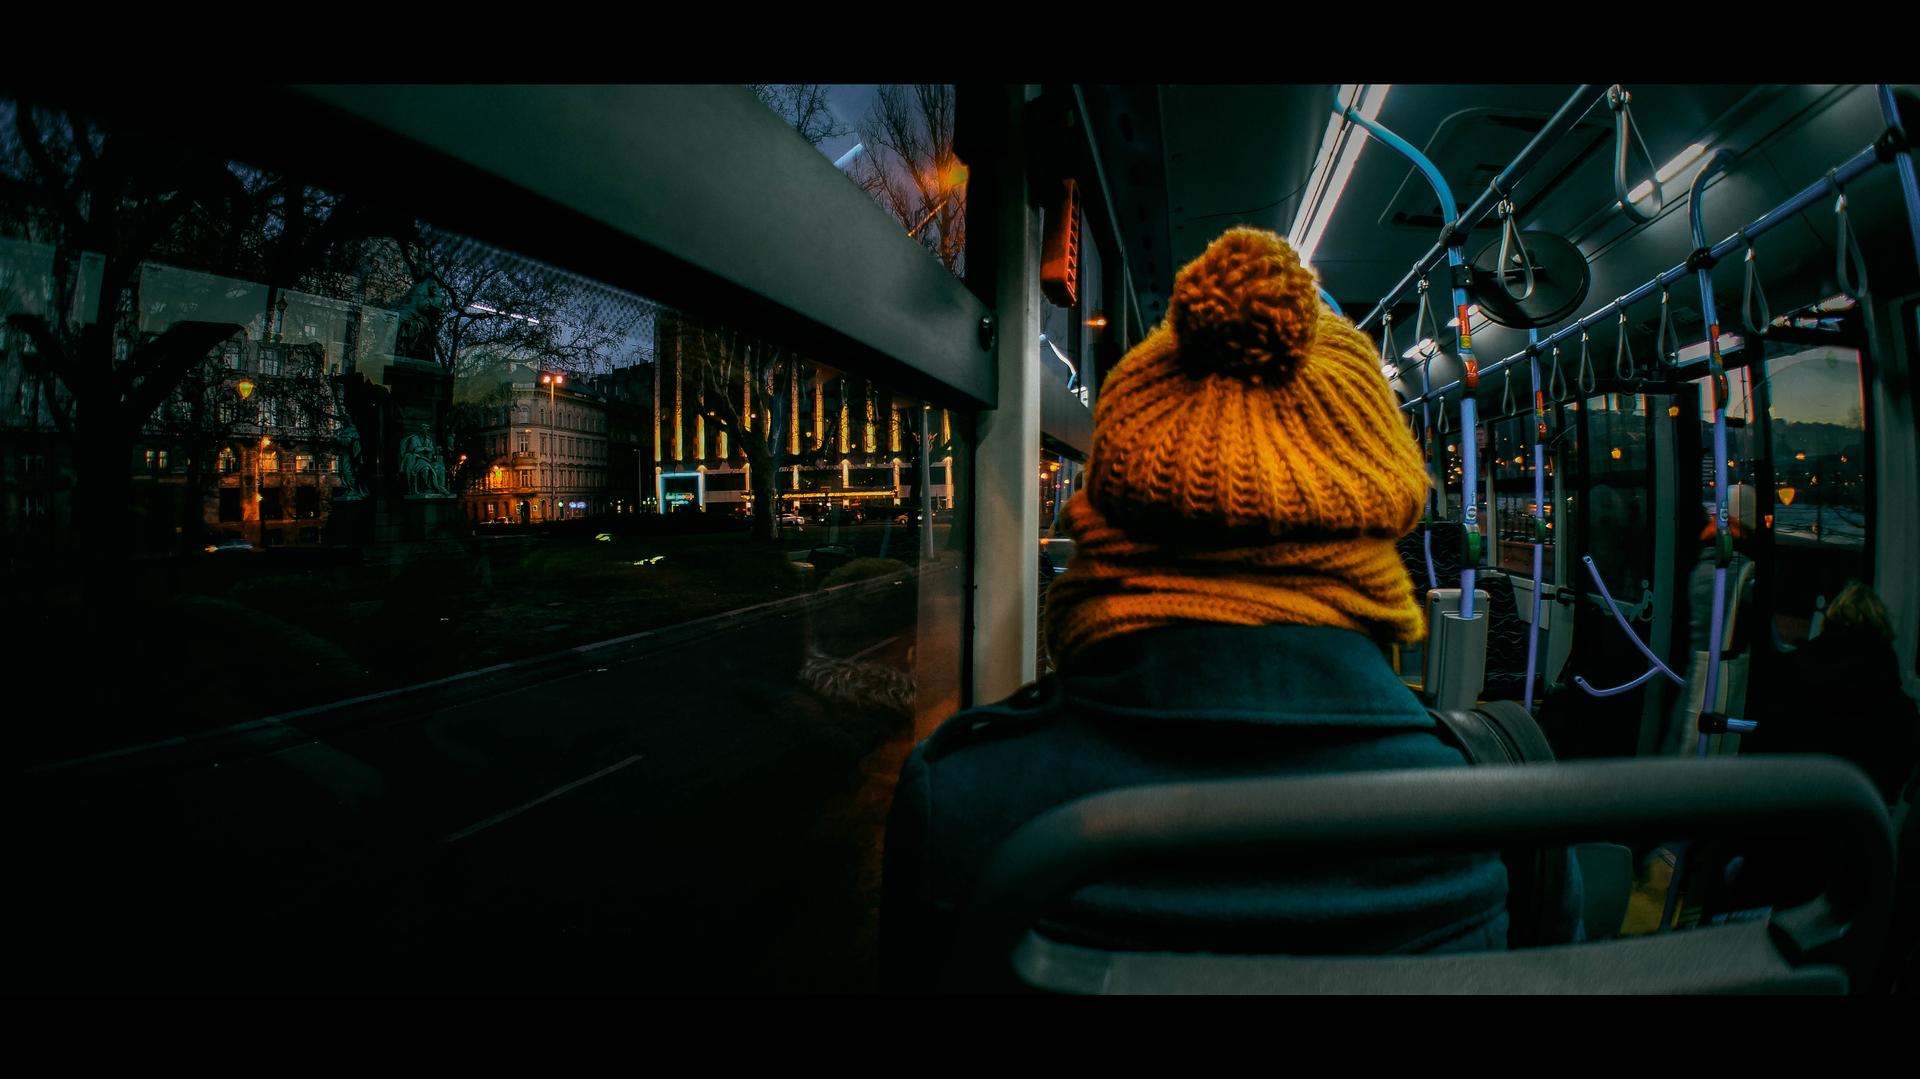 Budapest, public transport